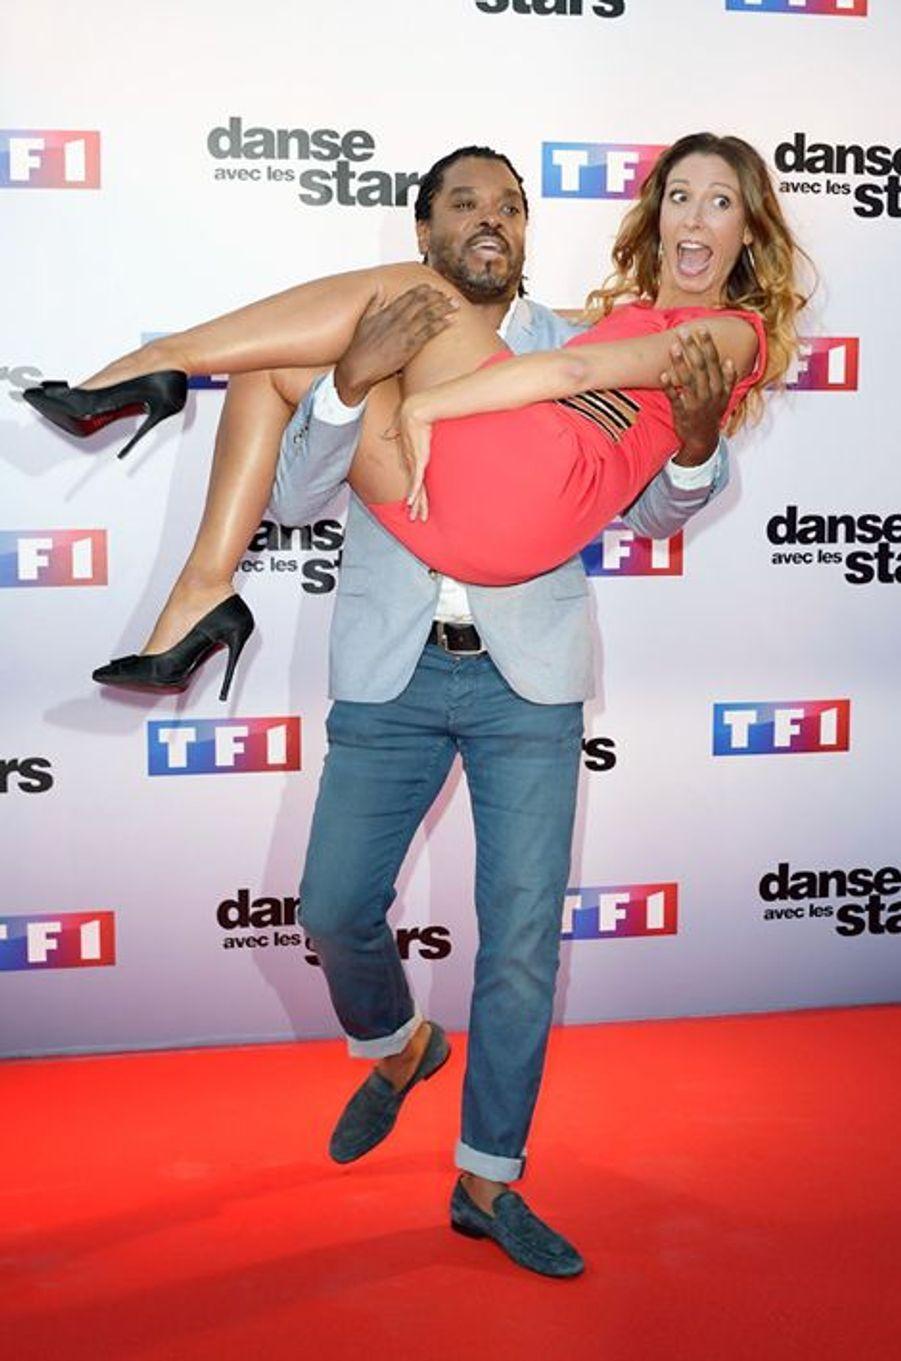 Danse avec les stars 5 : l'humoriste Anthony Kavanagh et la danseuse Silvia Notargiacomo.